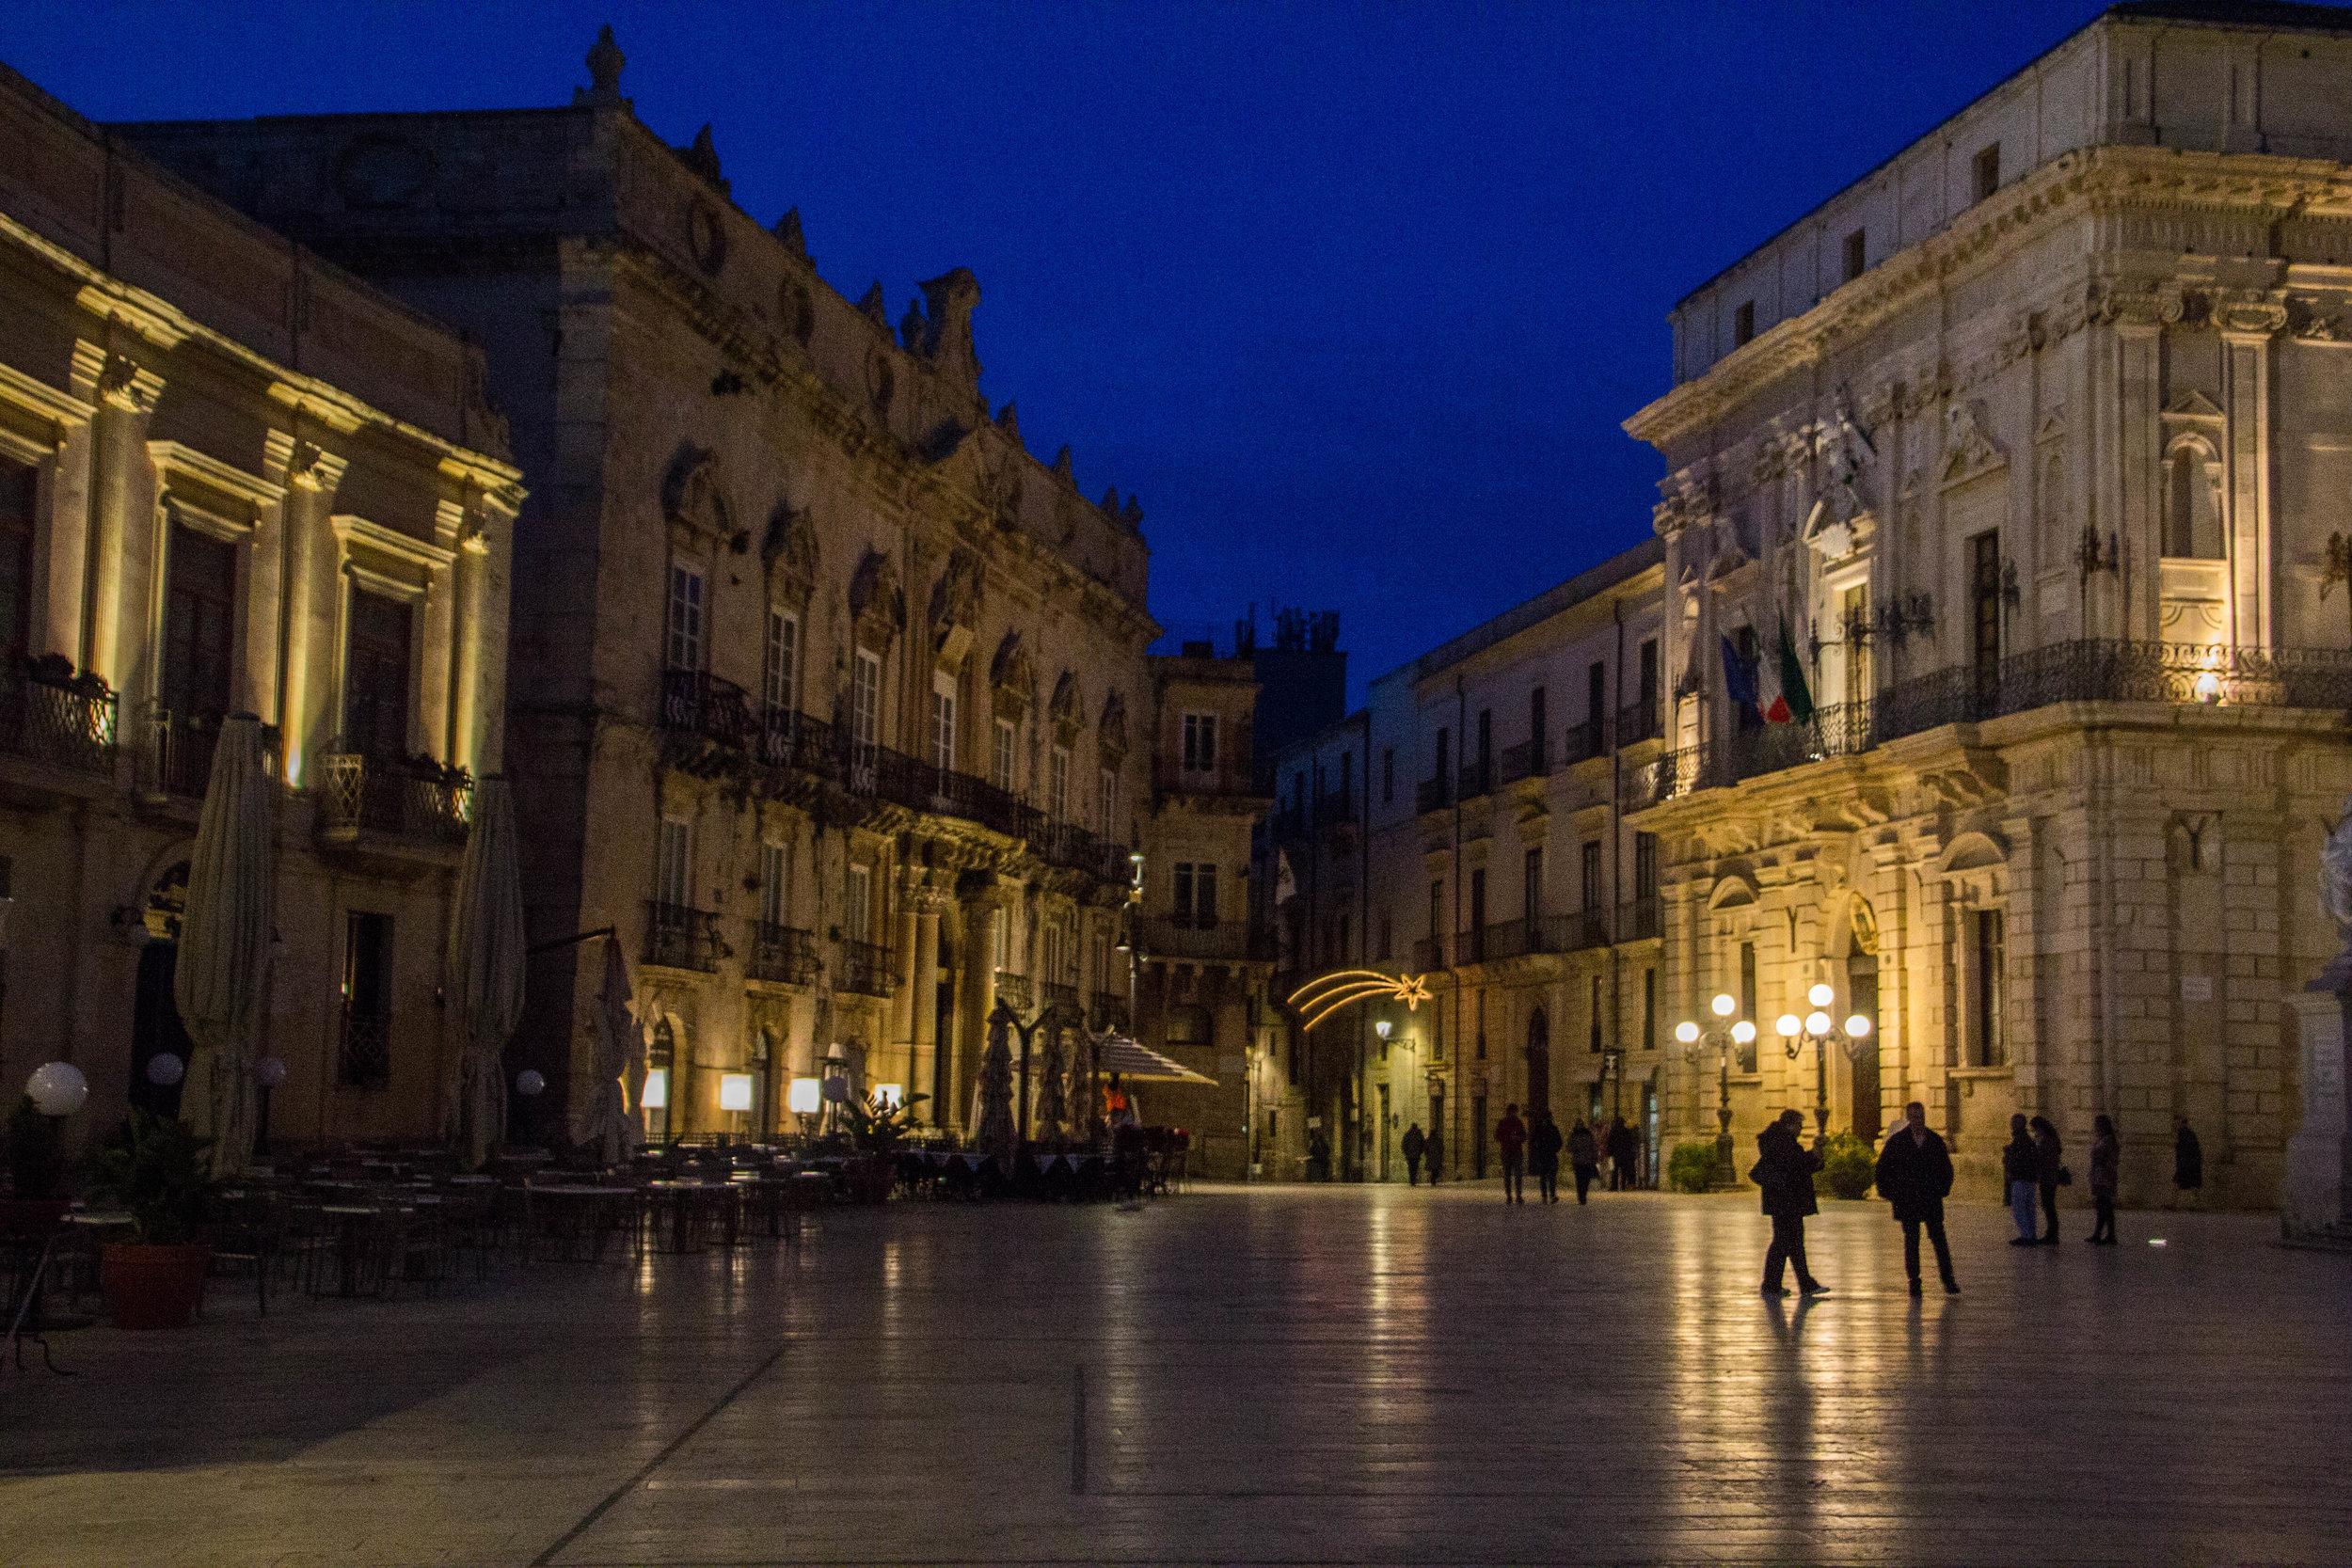 piazza-duomo-sunset-ortygia-syracuse-sicily-37.jpg